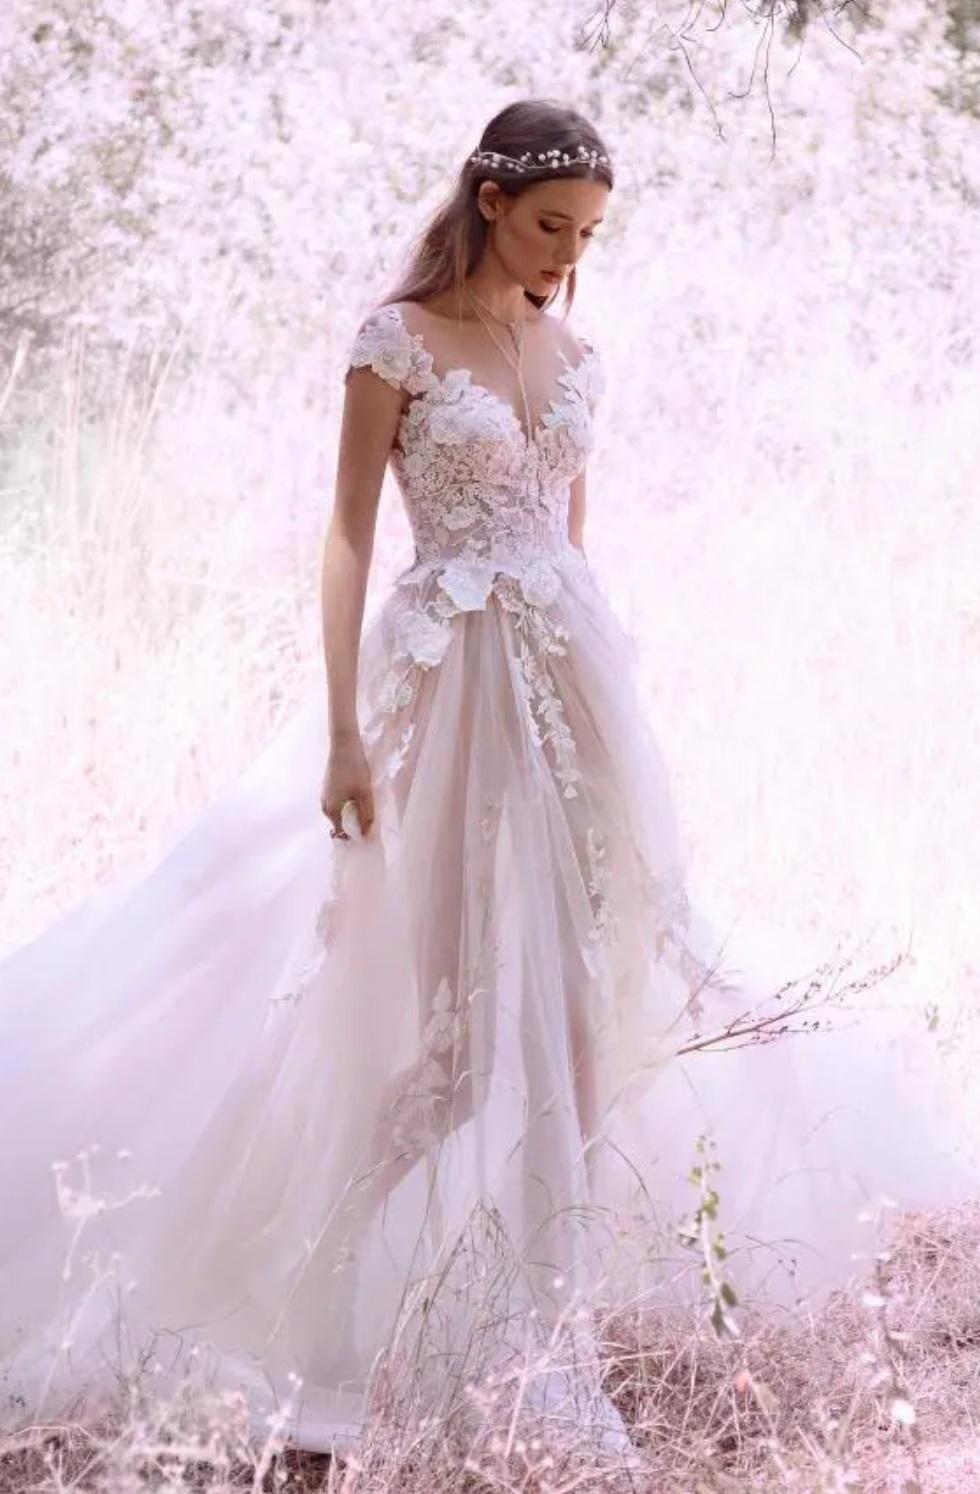 galia lahav - Vestidos de noiva românticos: Inspirações